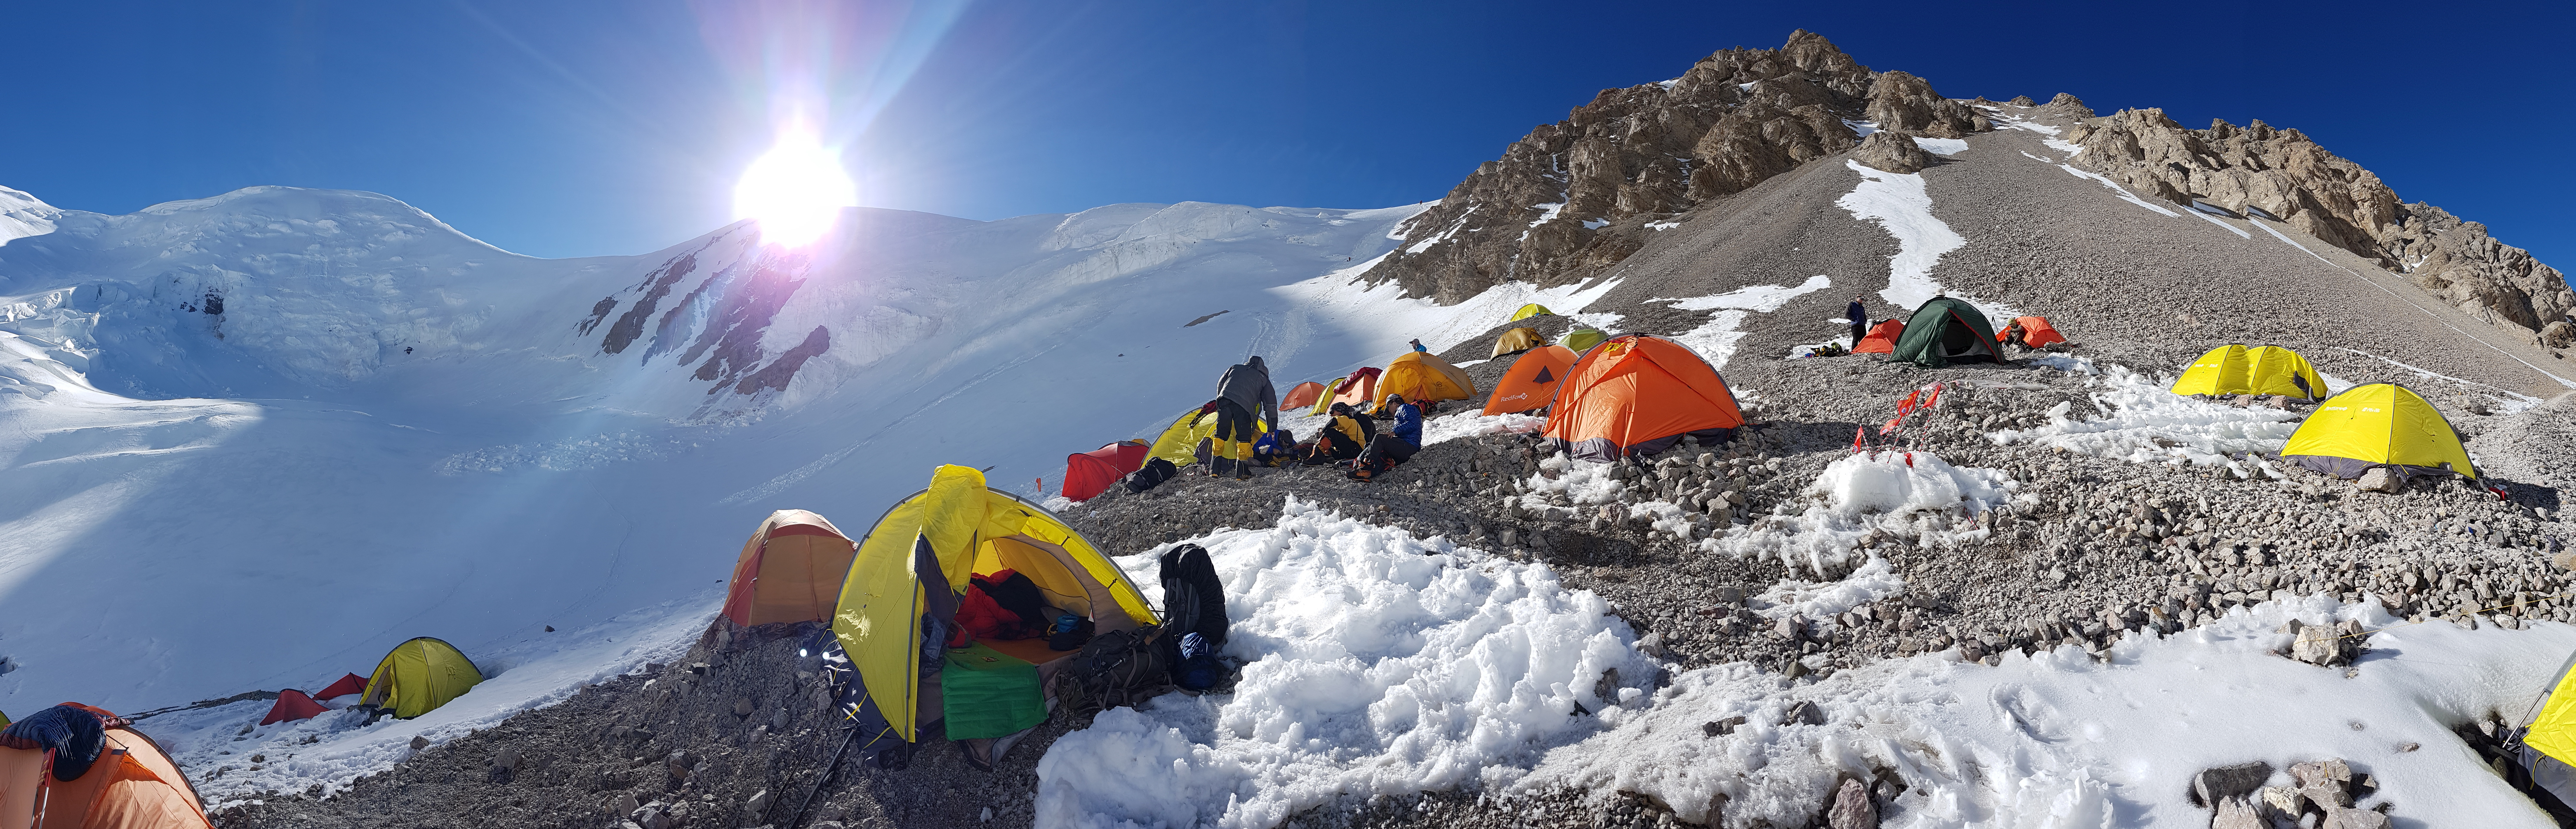 Peak Lenin - camp 2 (Kyrgyzstan)